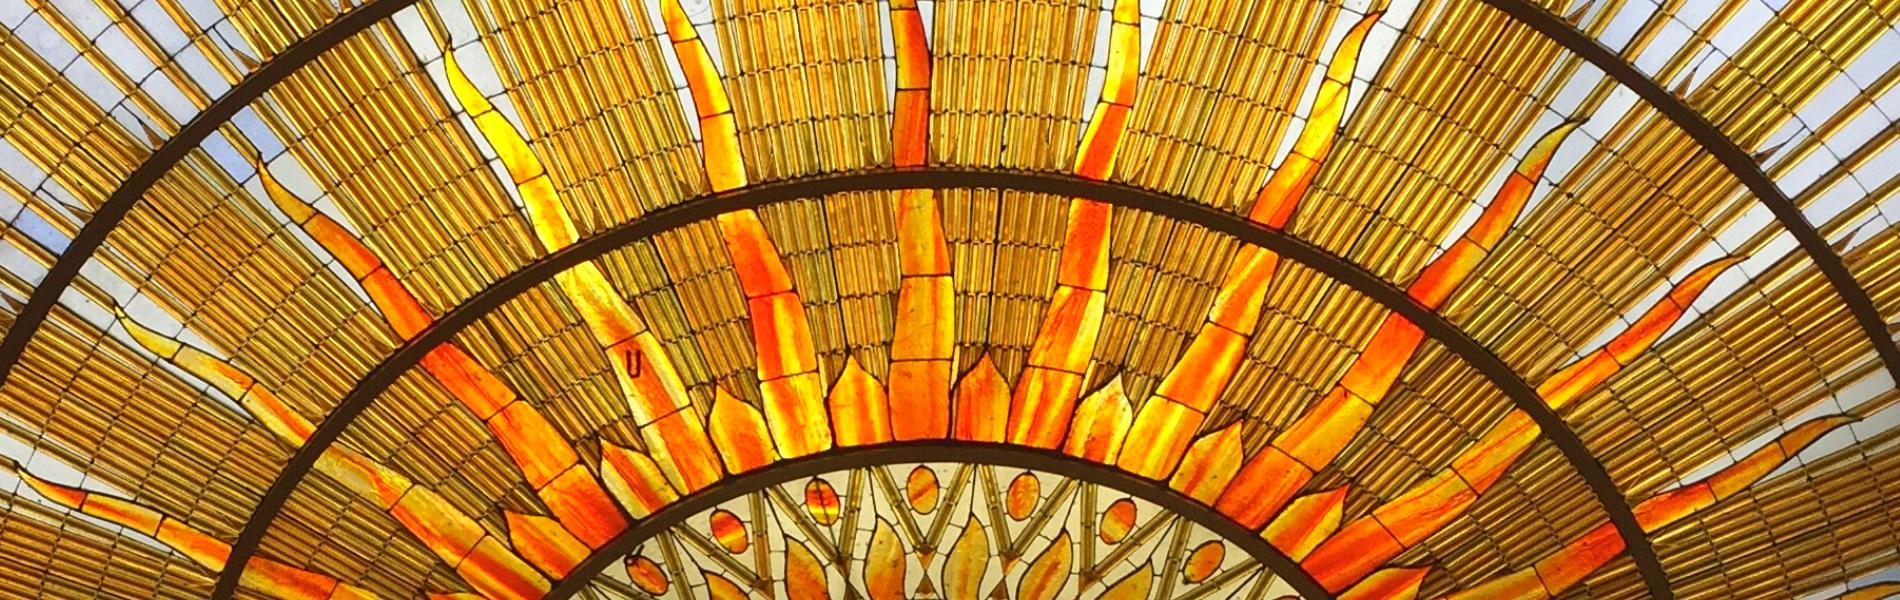 City Hall Sunburst